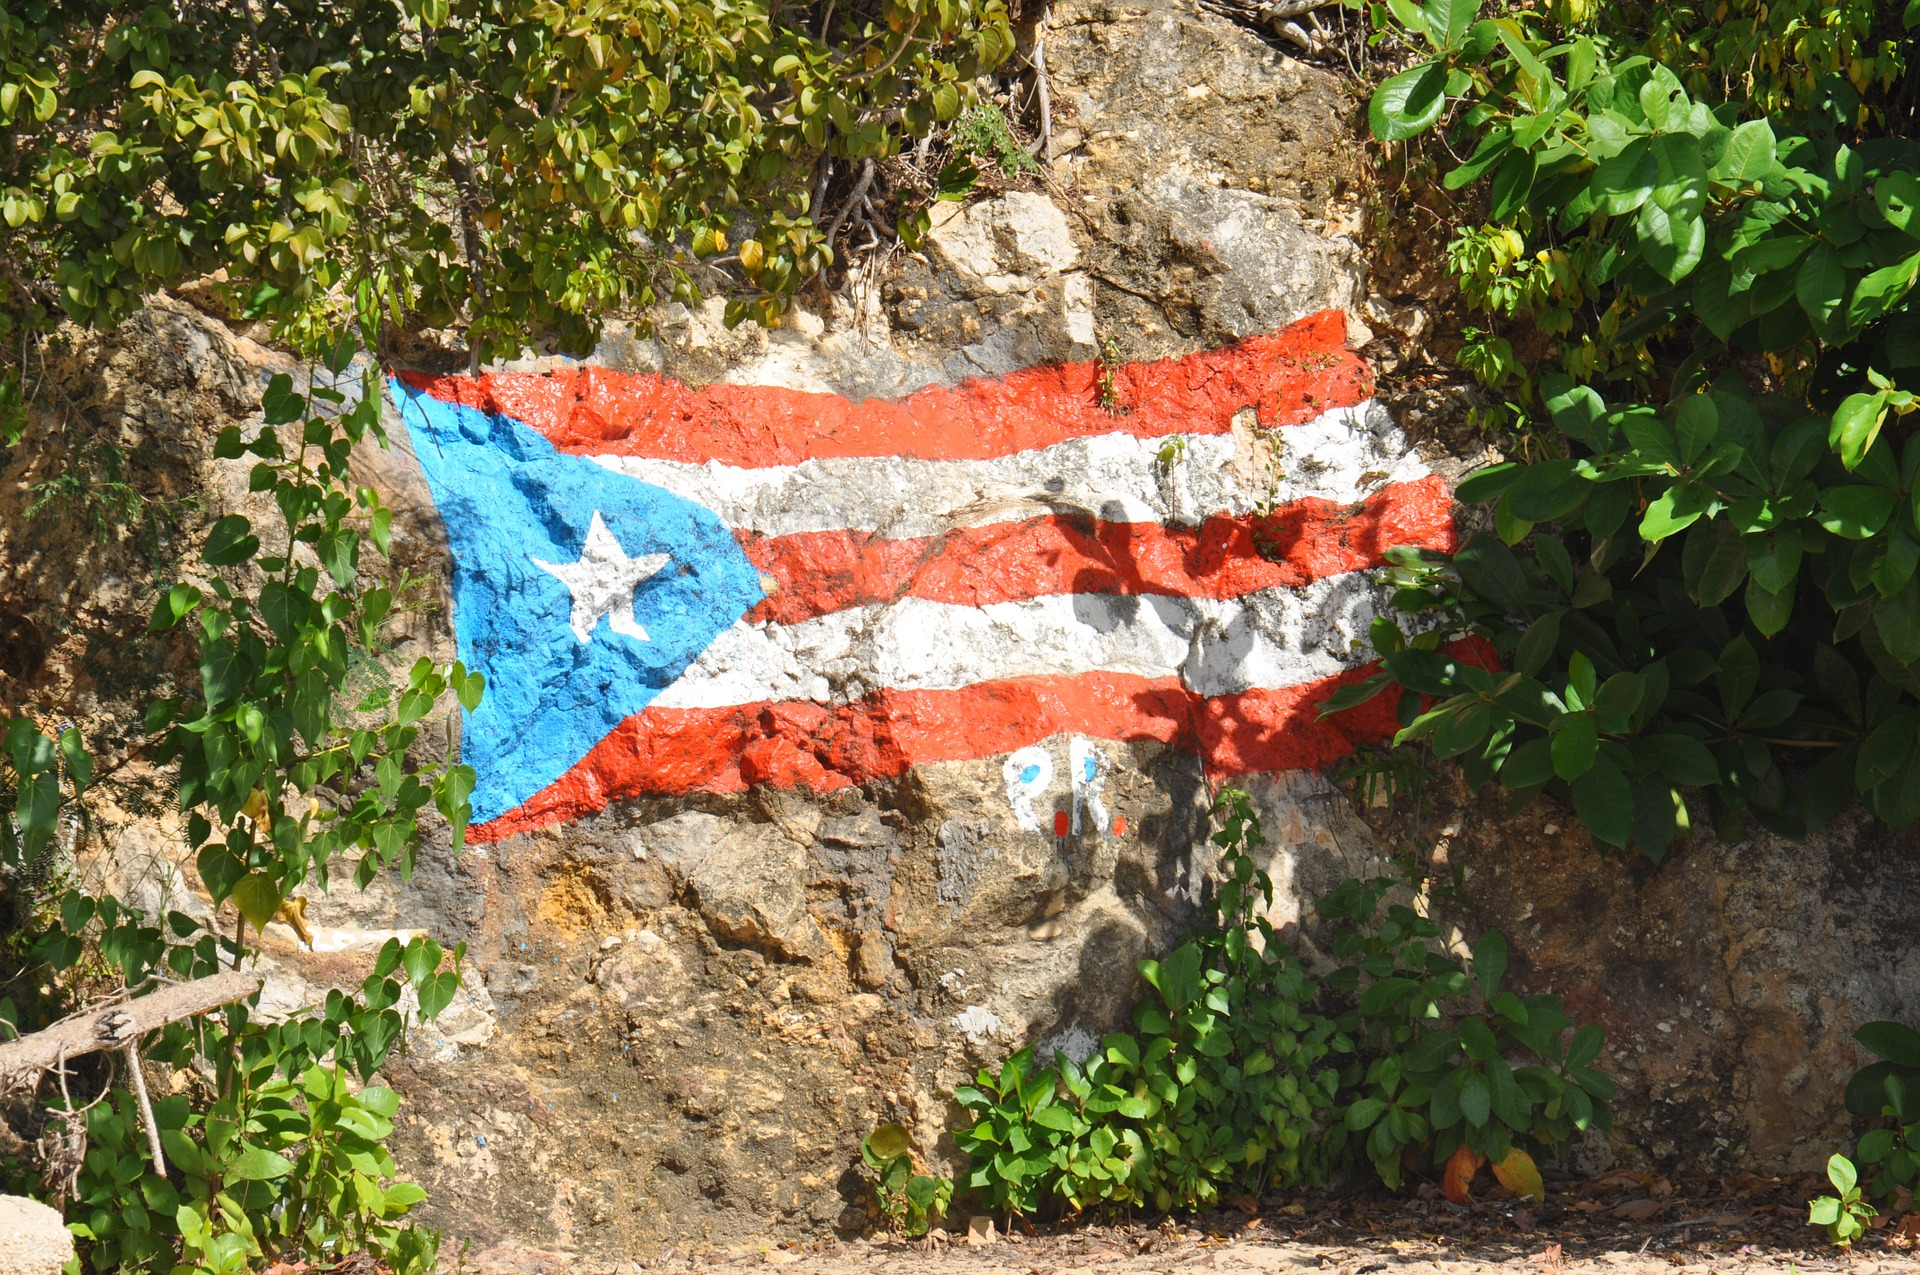 8 AVRIL 2016 – PUERTO RICO, LA GRECE DES CARAIBES